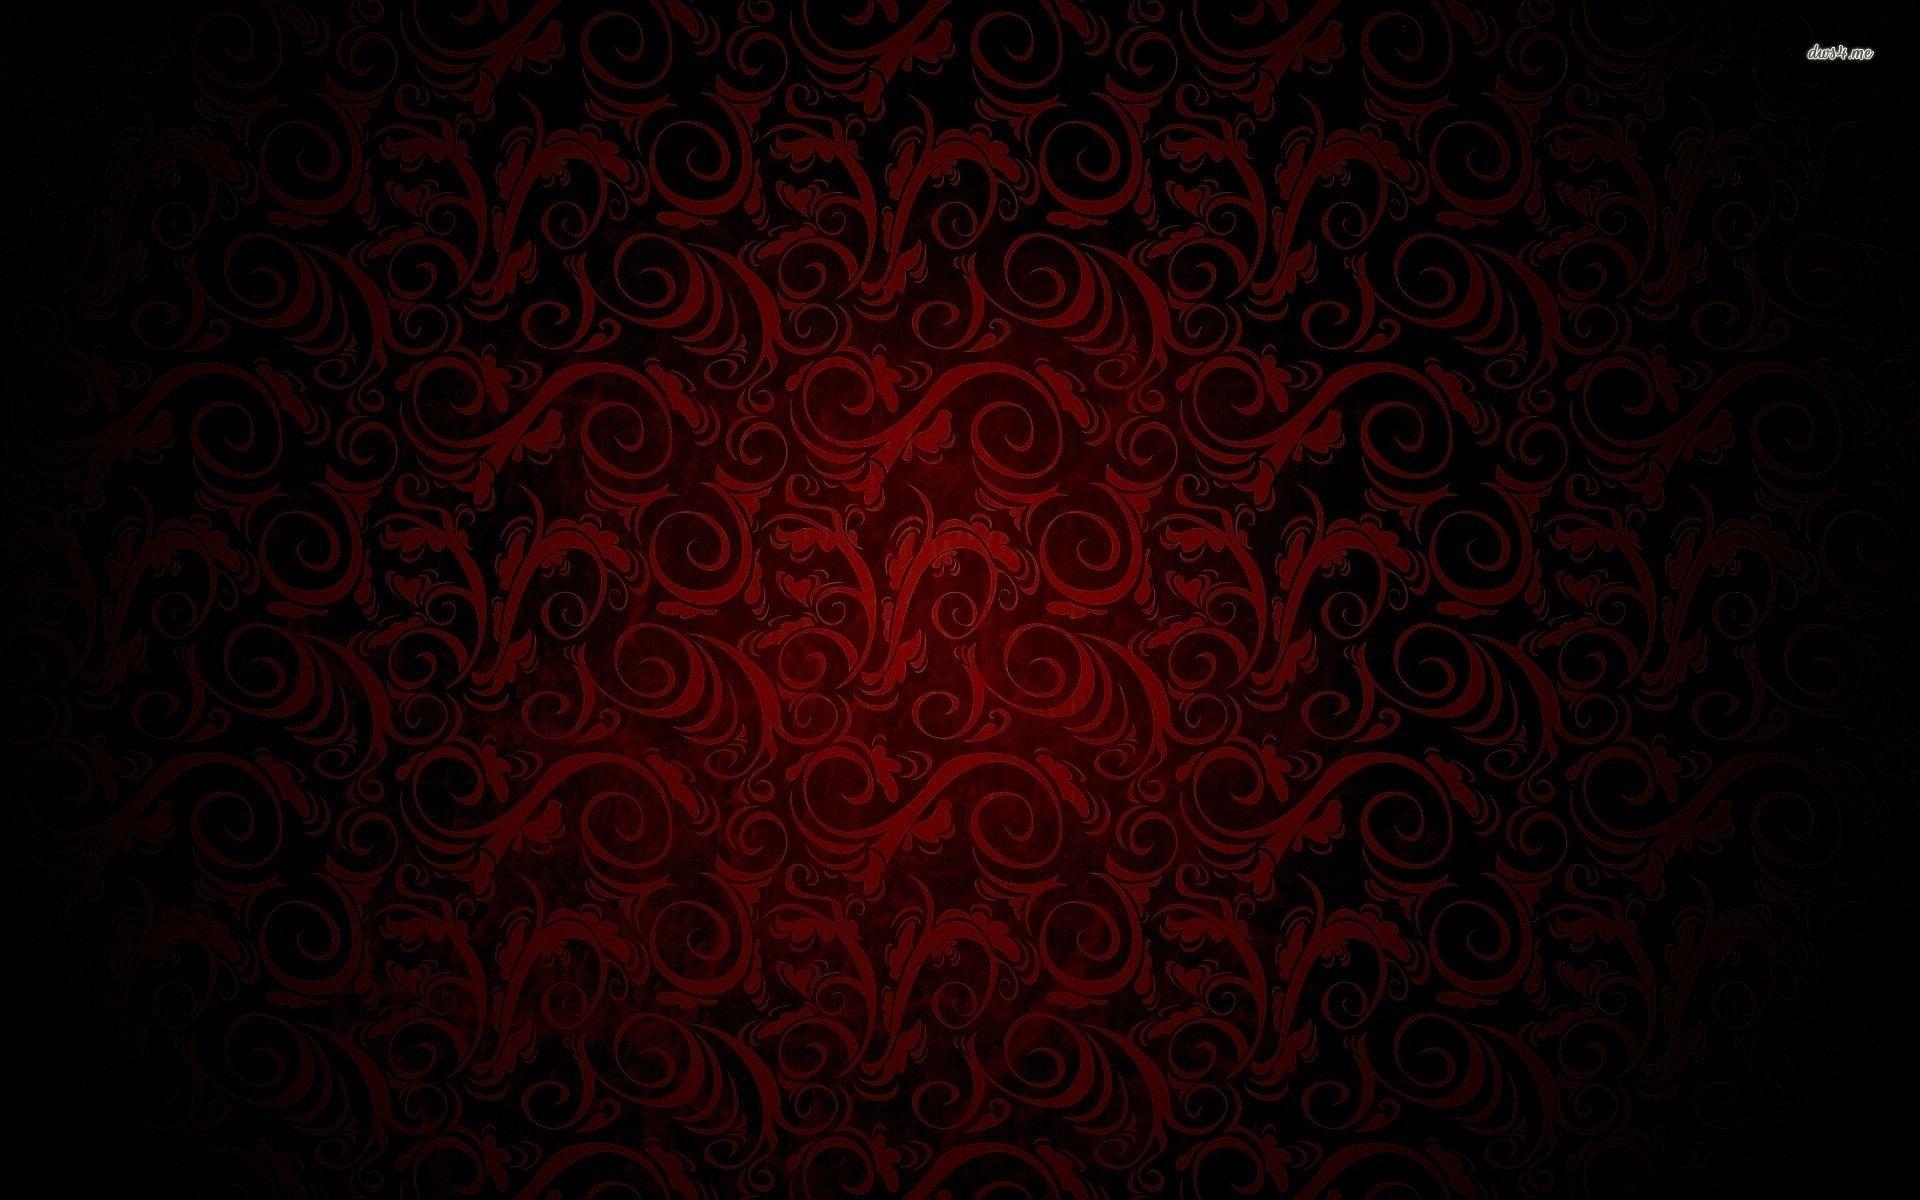 Swirl Pattern Wallpapers Royal Pattern Pattern Wallpaper Red And Black Wallpaper